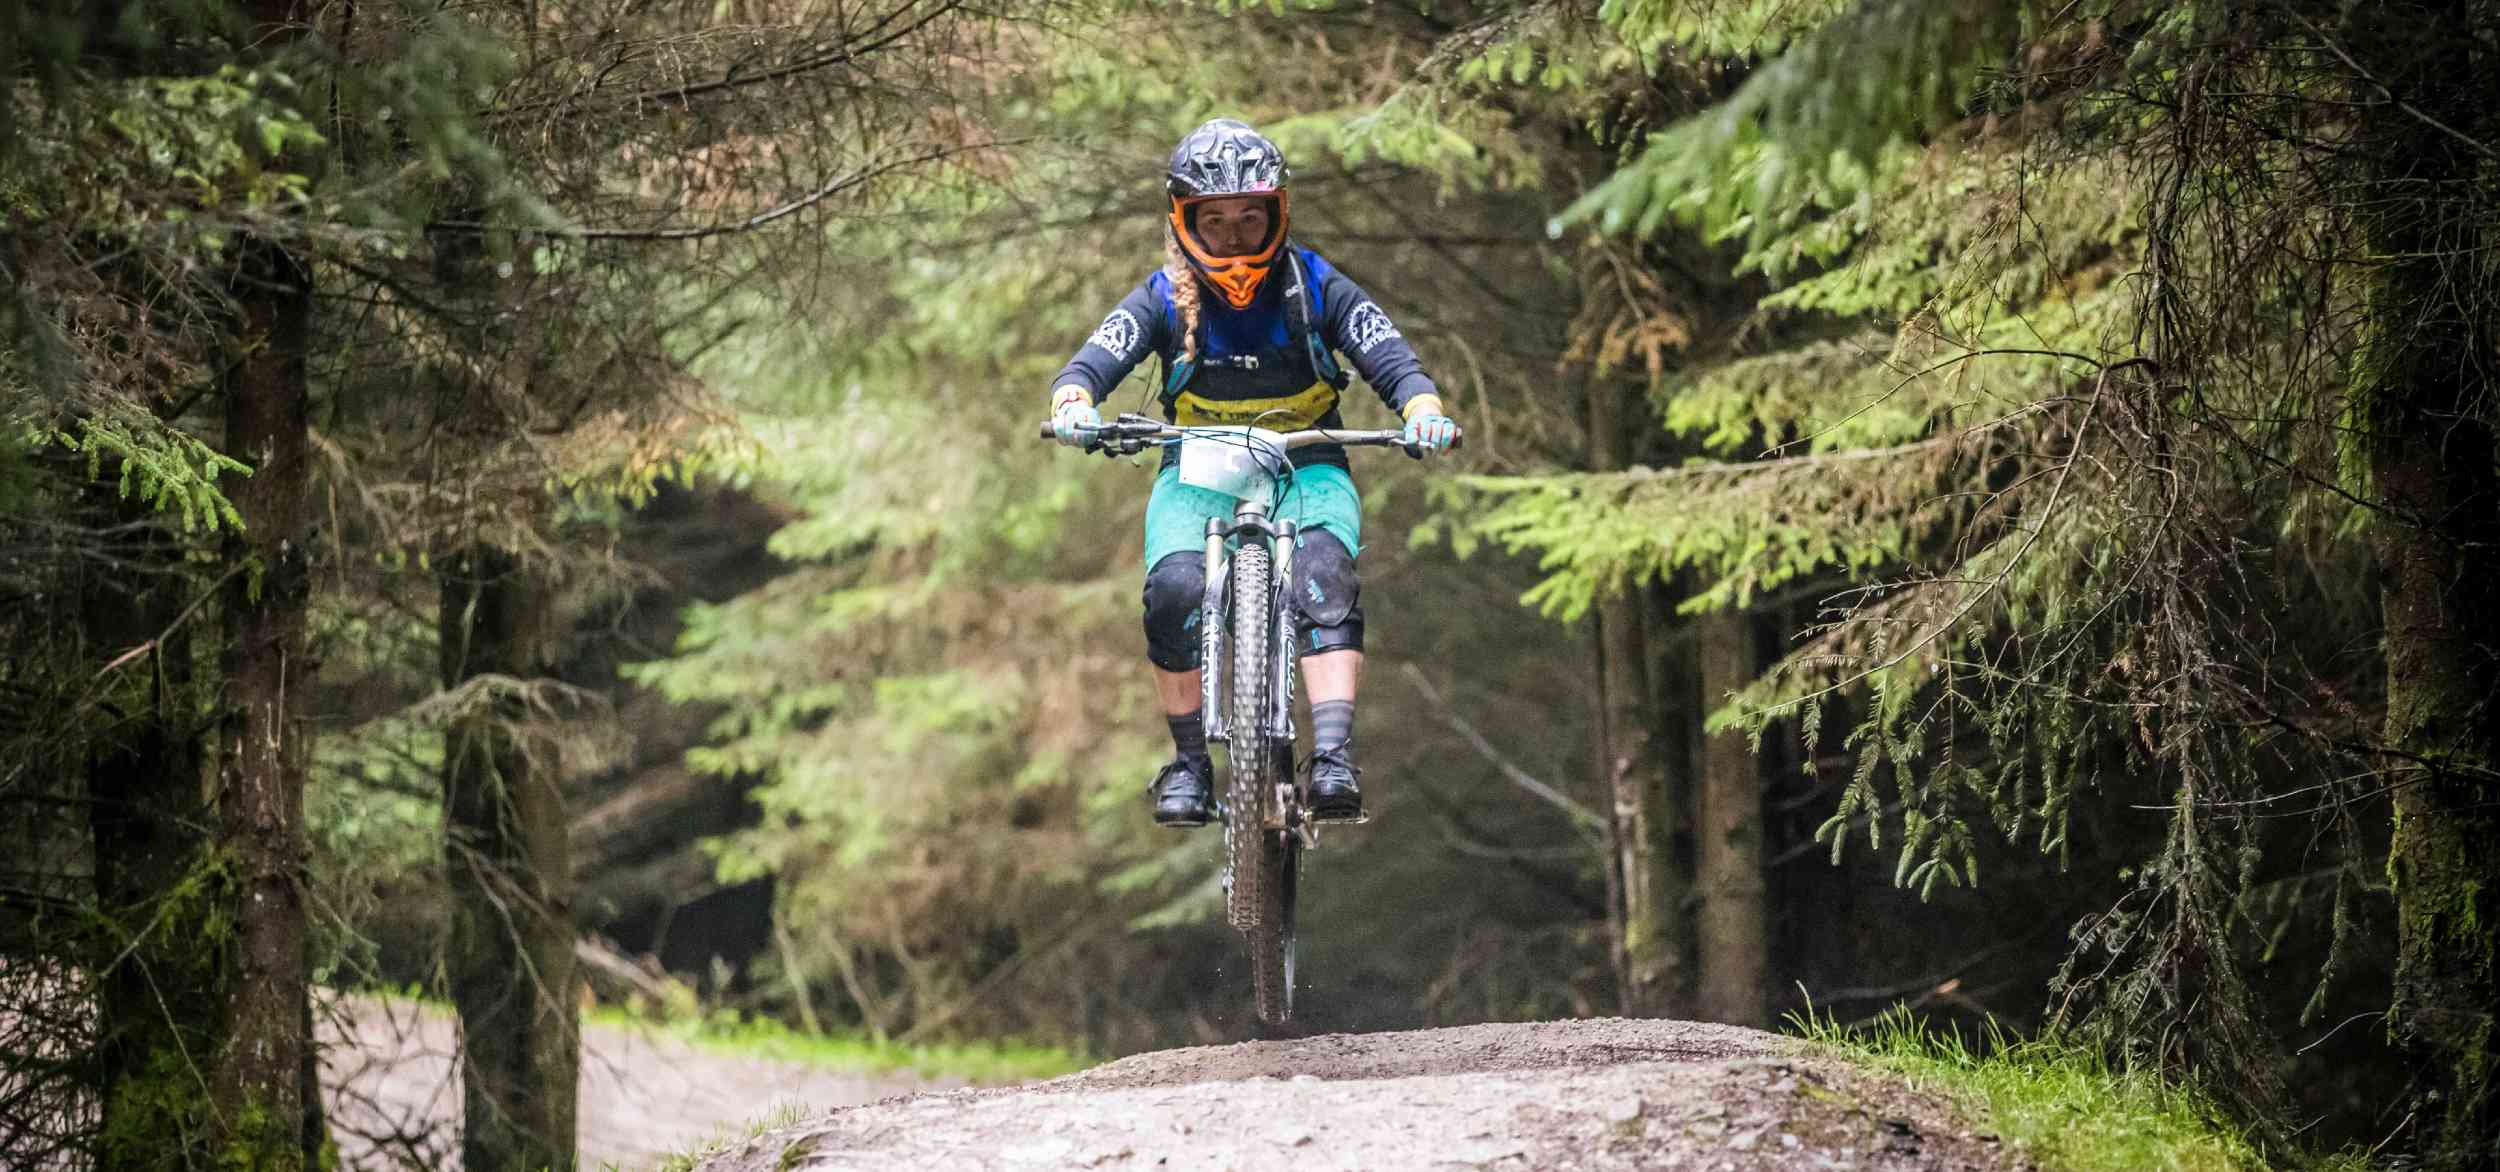 Alice getting air on her mountain bike